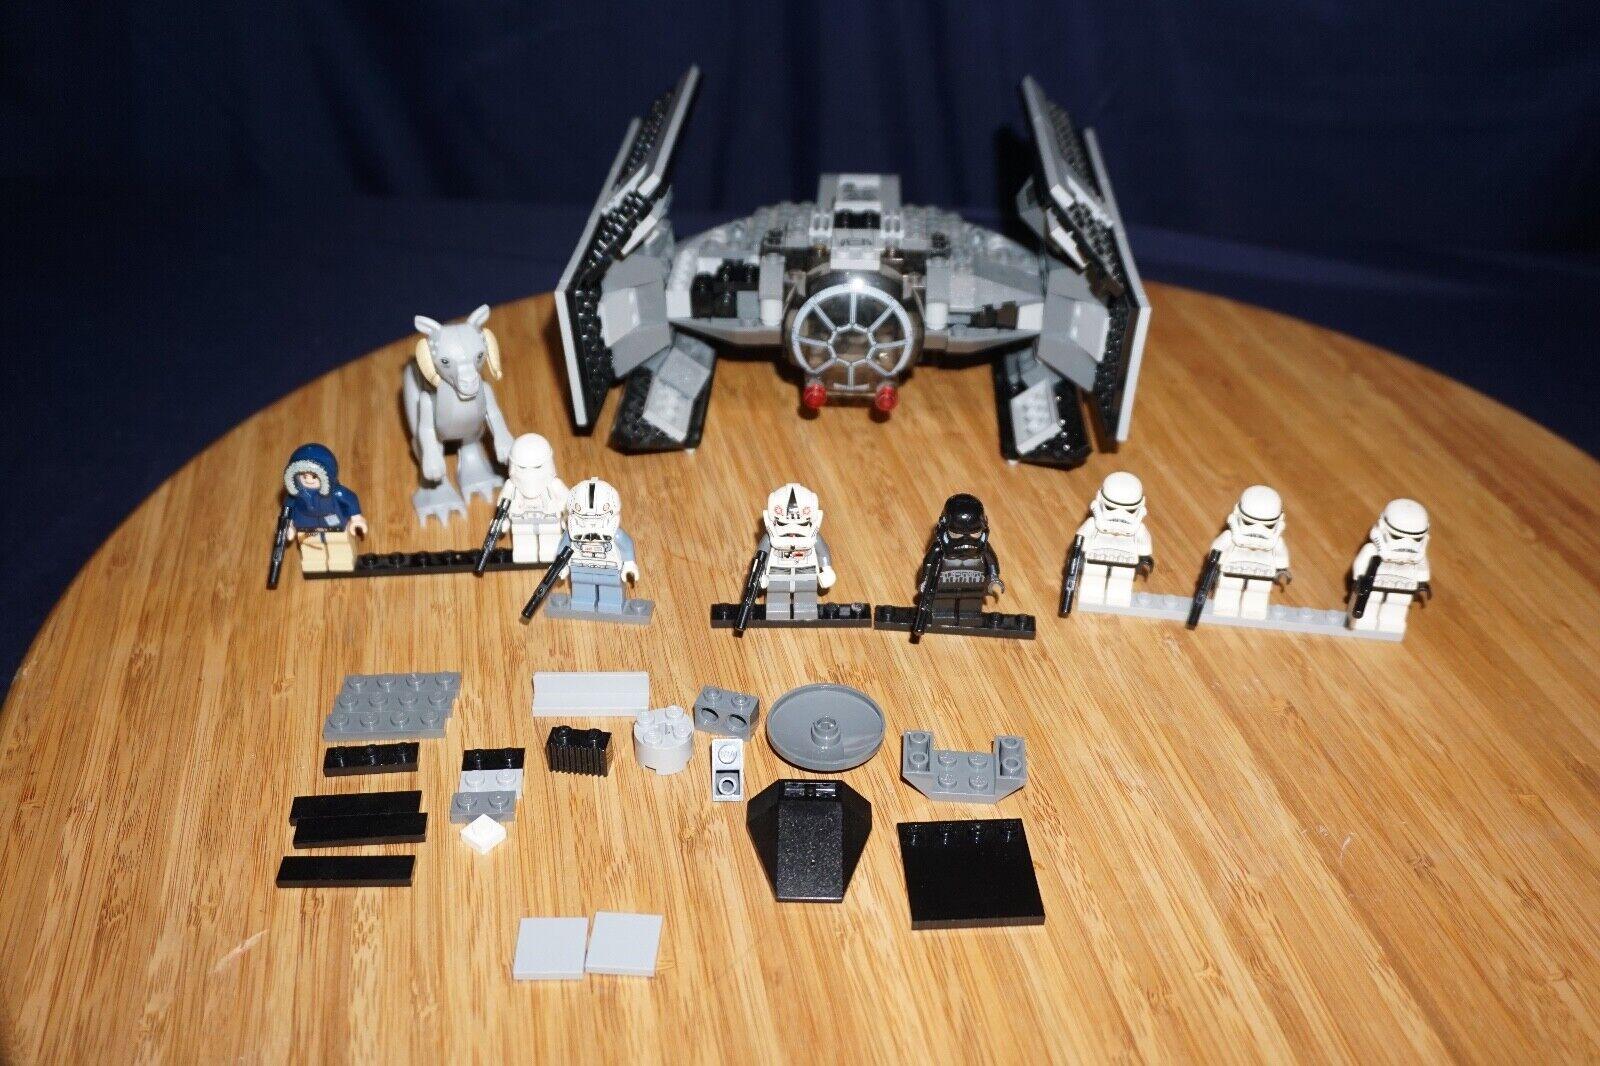 Estrella guerras LEGO 75082 TIE FIGHTER 8  MINI cifraS calienteH TAUNTAUN STORM TROOPERS  a prezzi accessibili